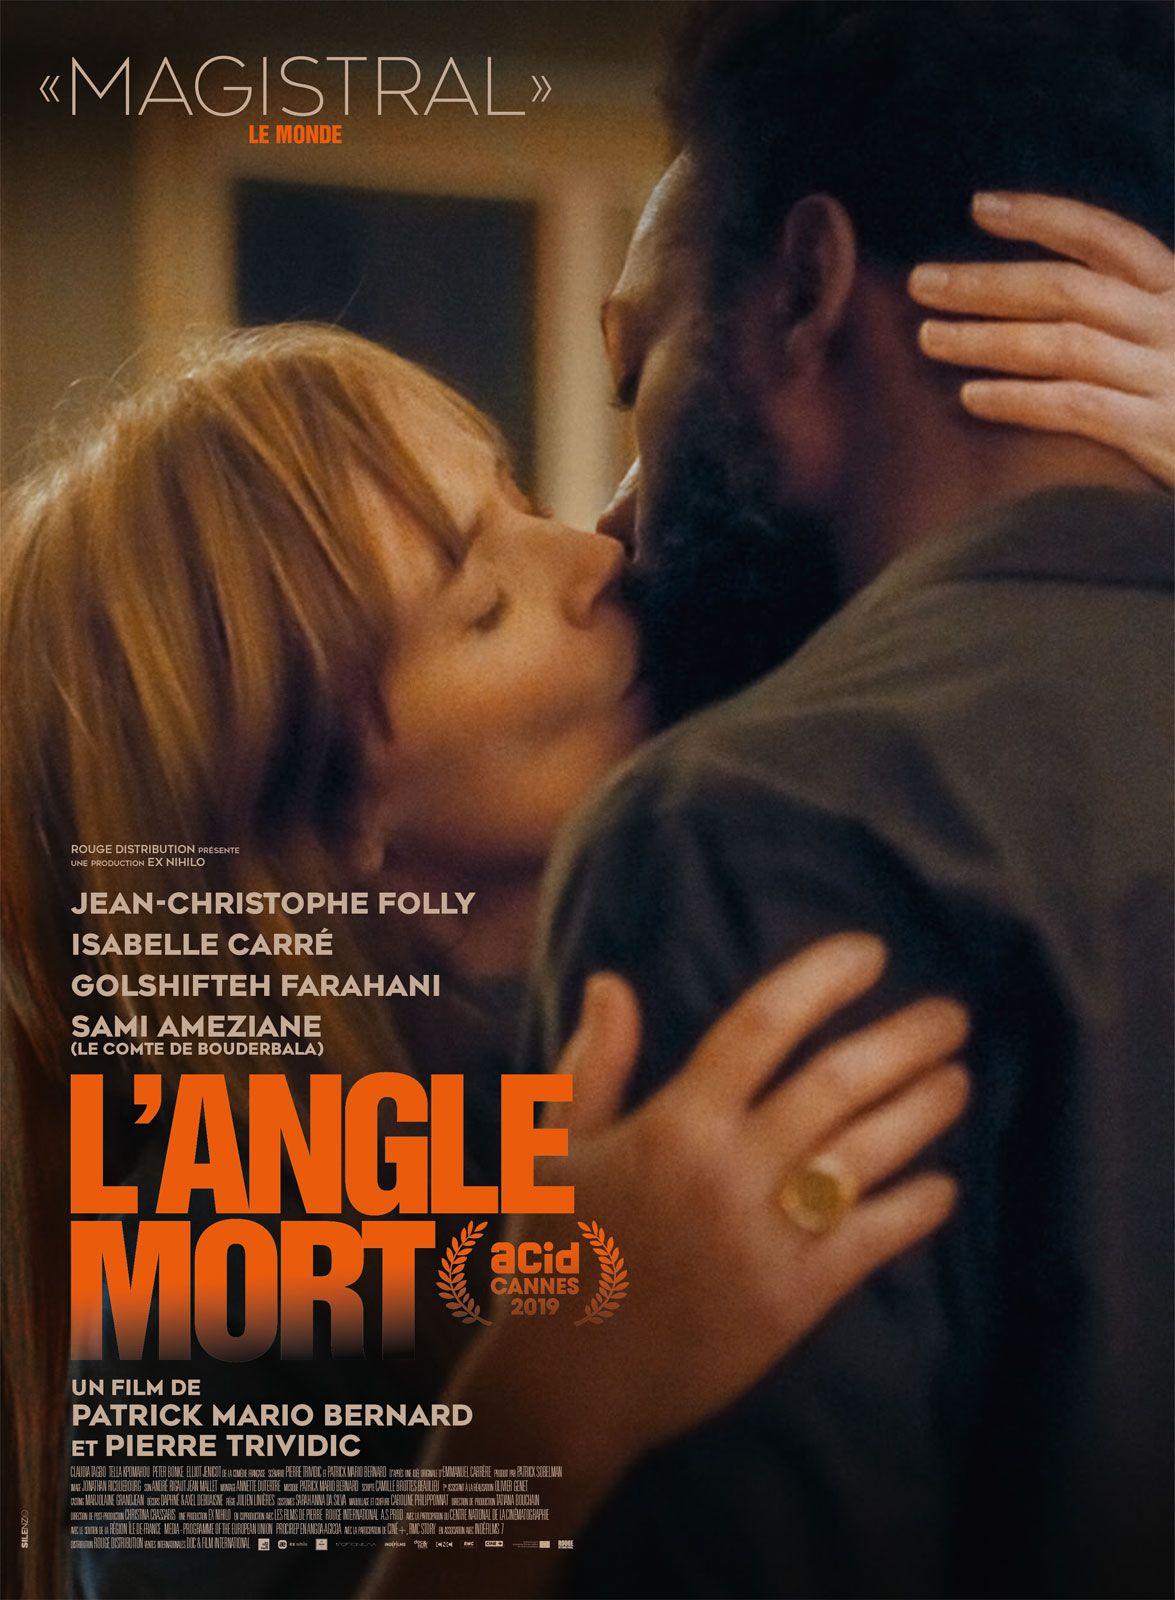 L'Angle mort - Film (2019)